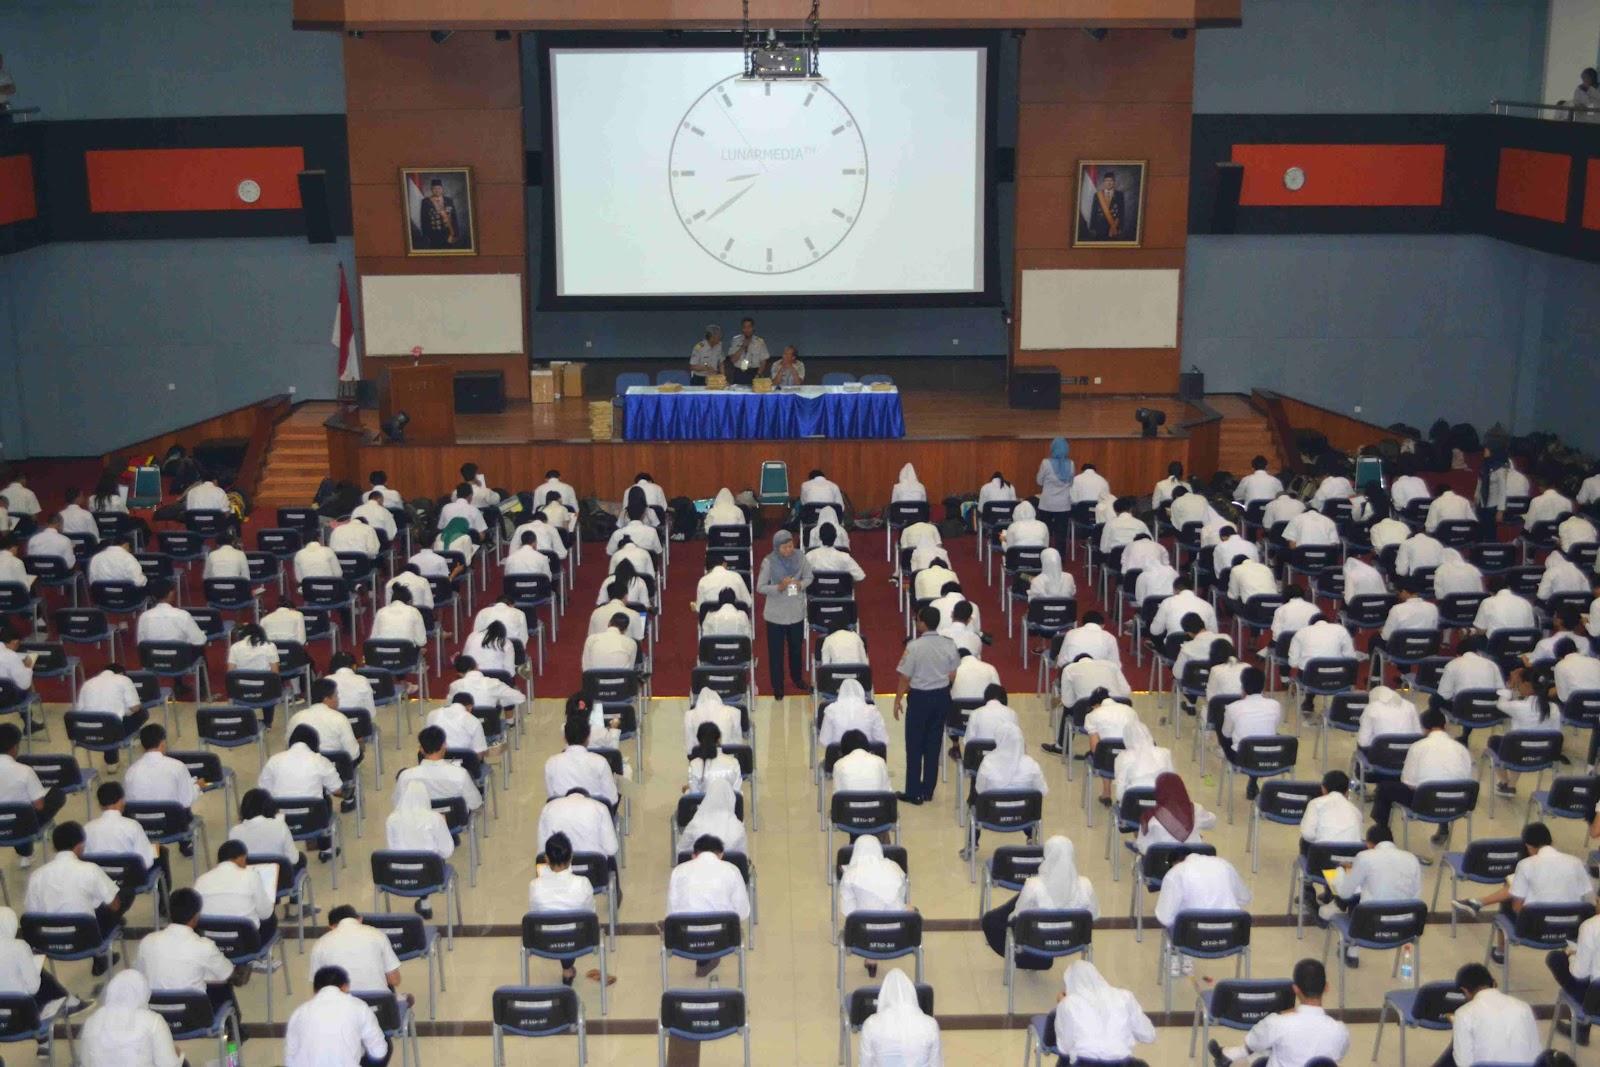 Penerimaan Dinas Perhubungan Kementerian Perhubungan Republik Indonesia Adapun Test Yang Sudah Dilaksanakan Kemarin Pada Tanggal 28 Juli 2012